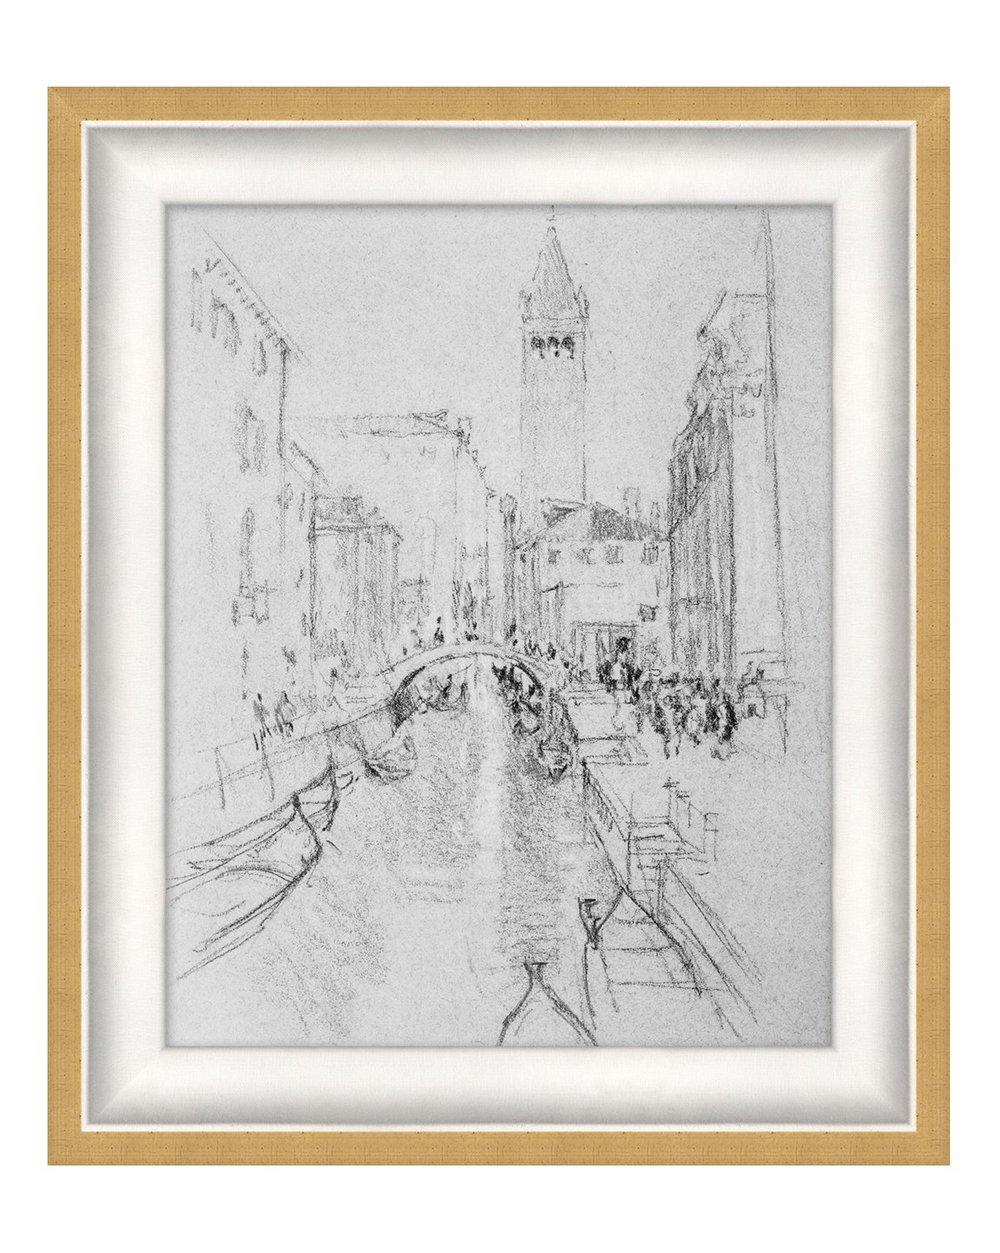 Canal_Sketch_1.jpg